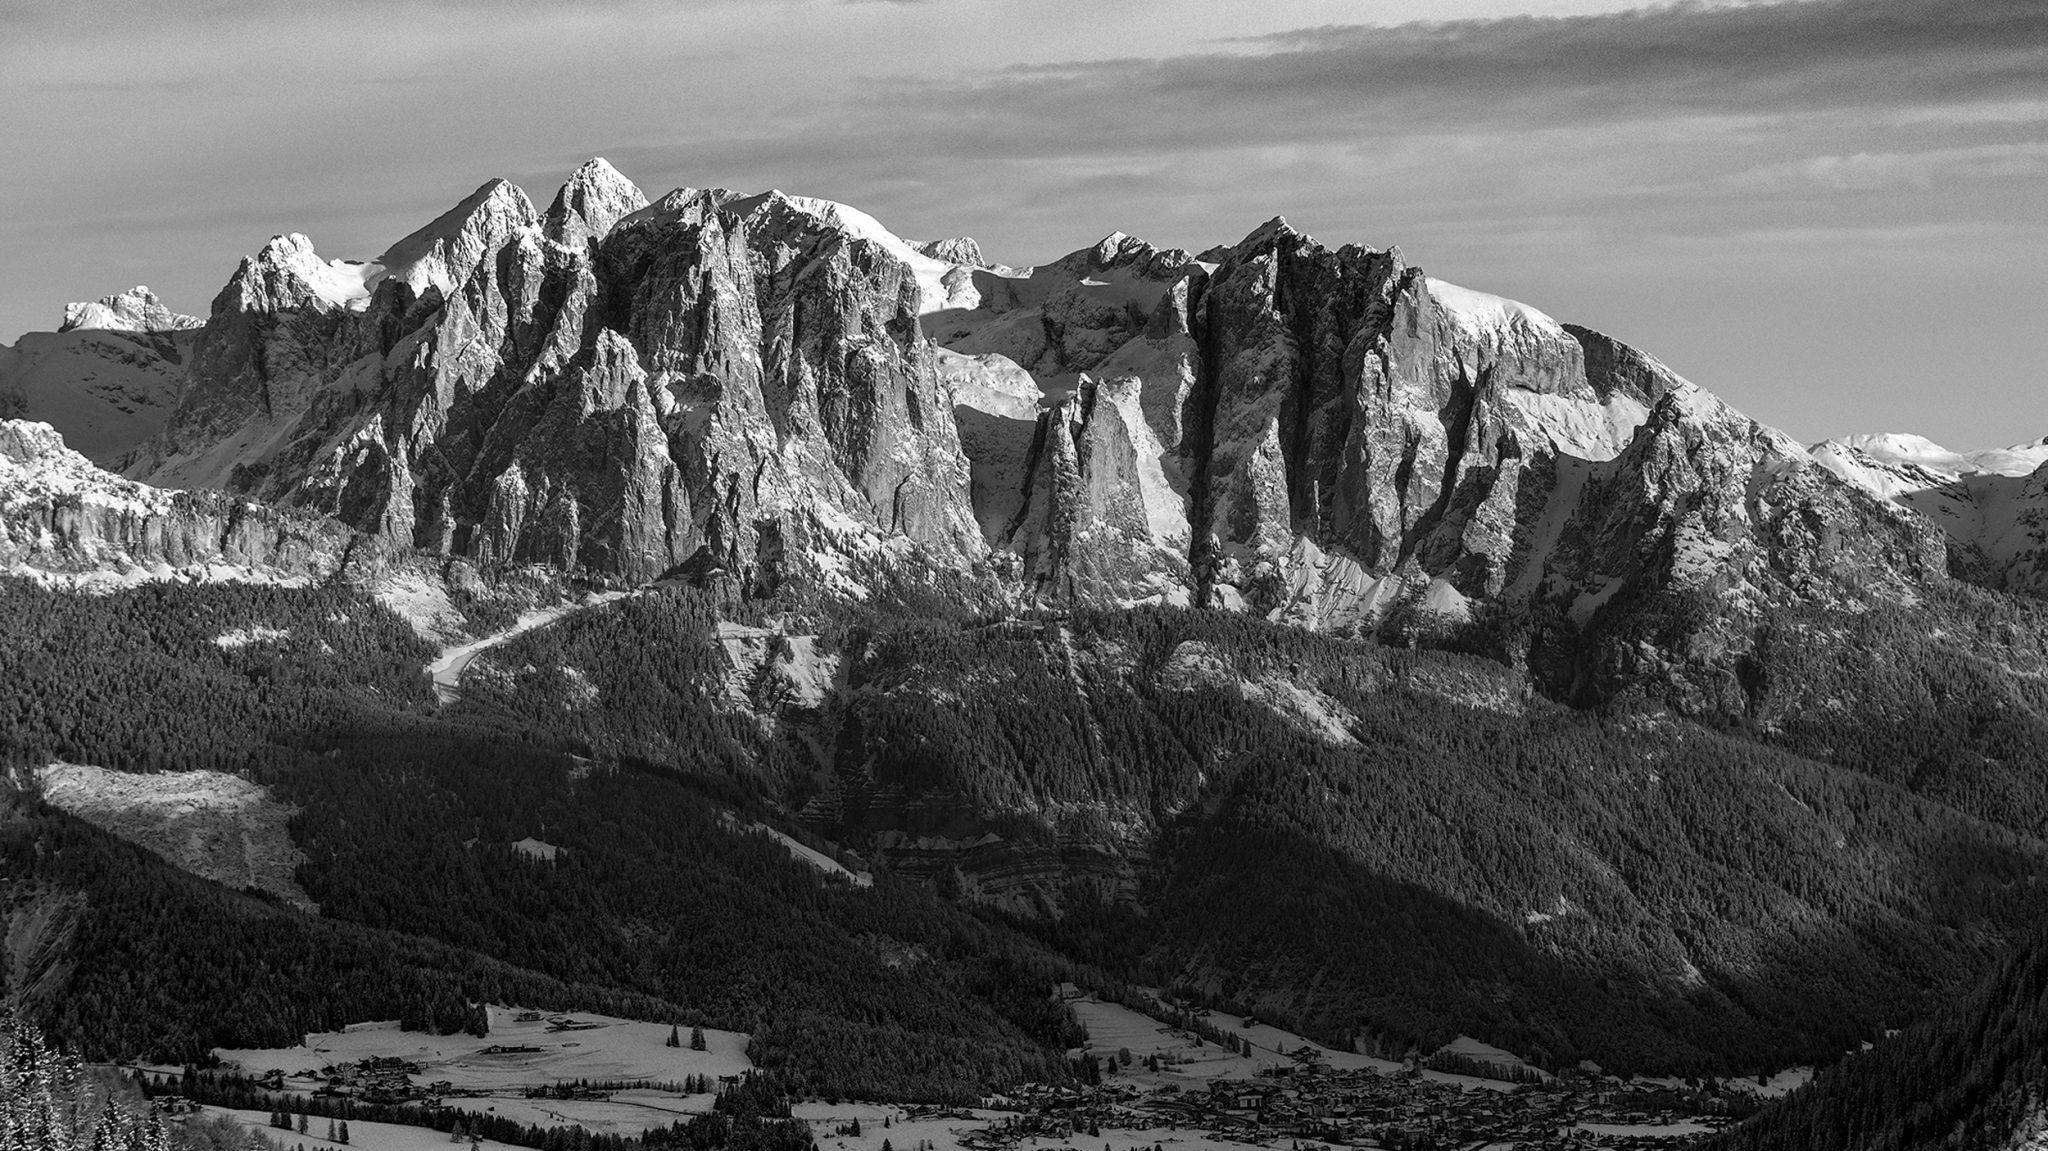 Early morning | Larsec Group, Fassa Dolomites,